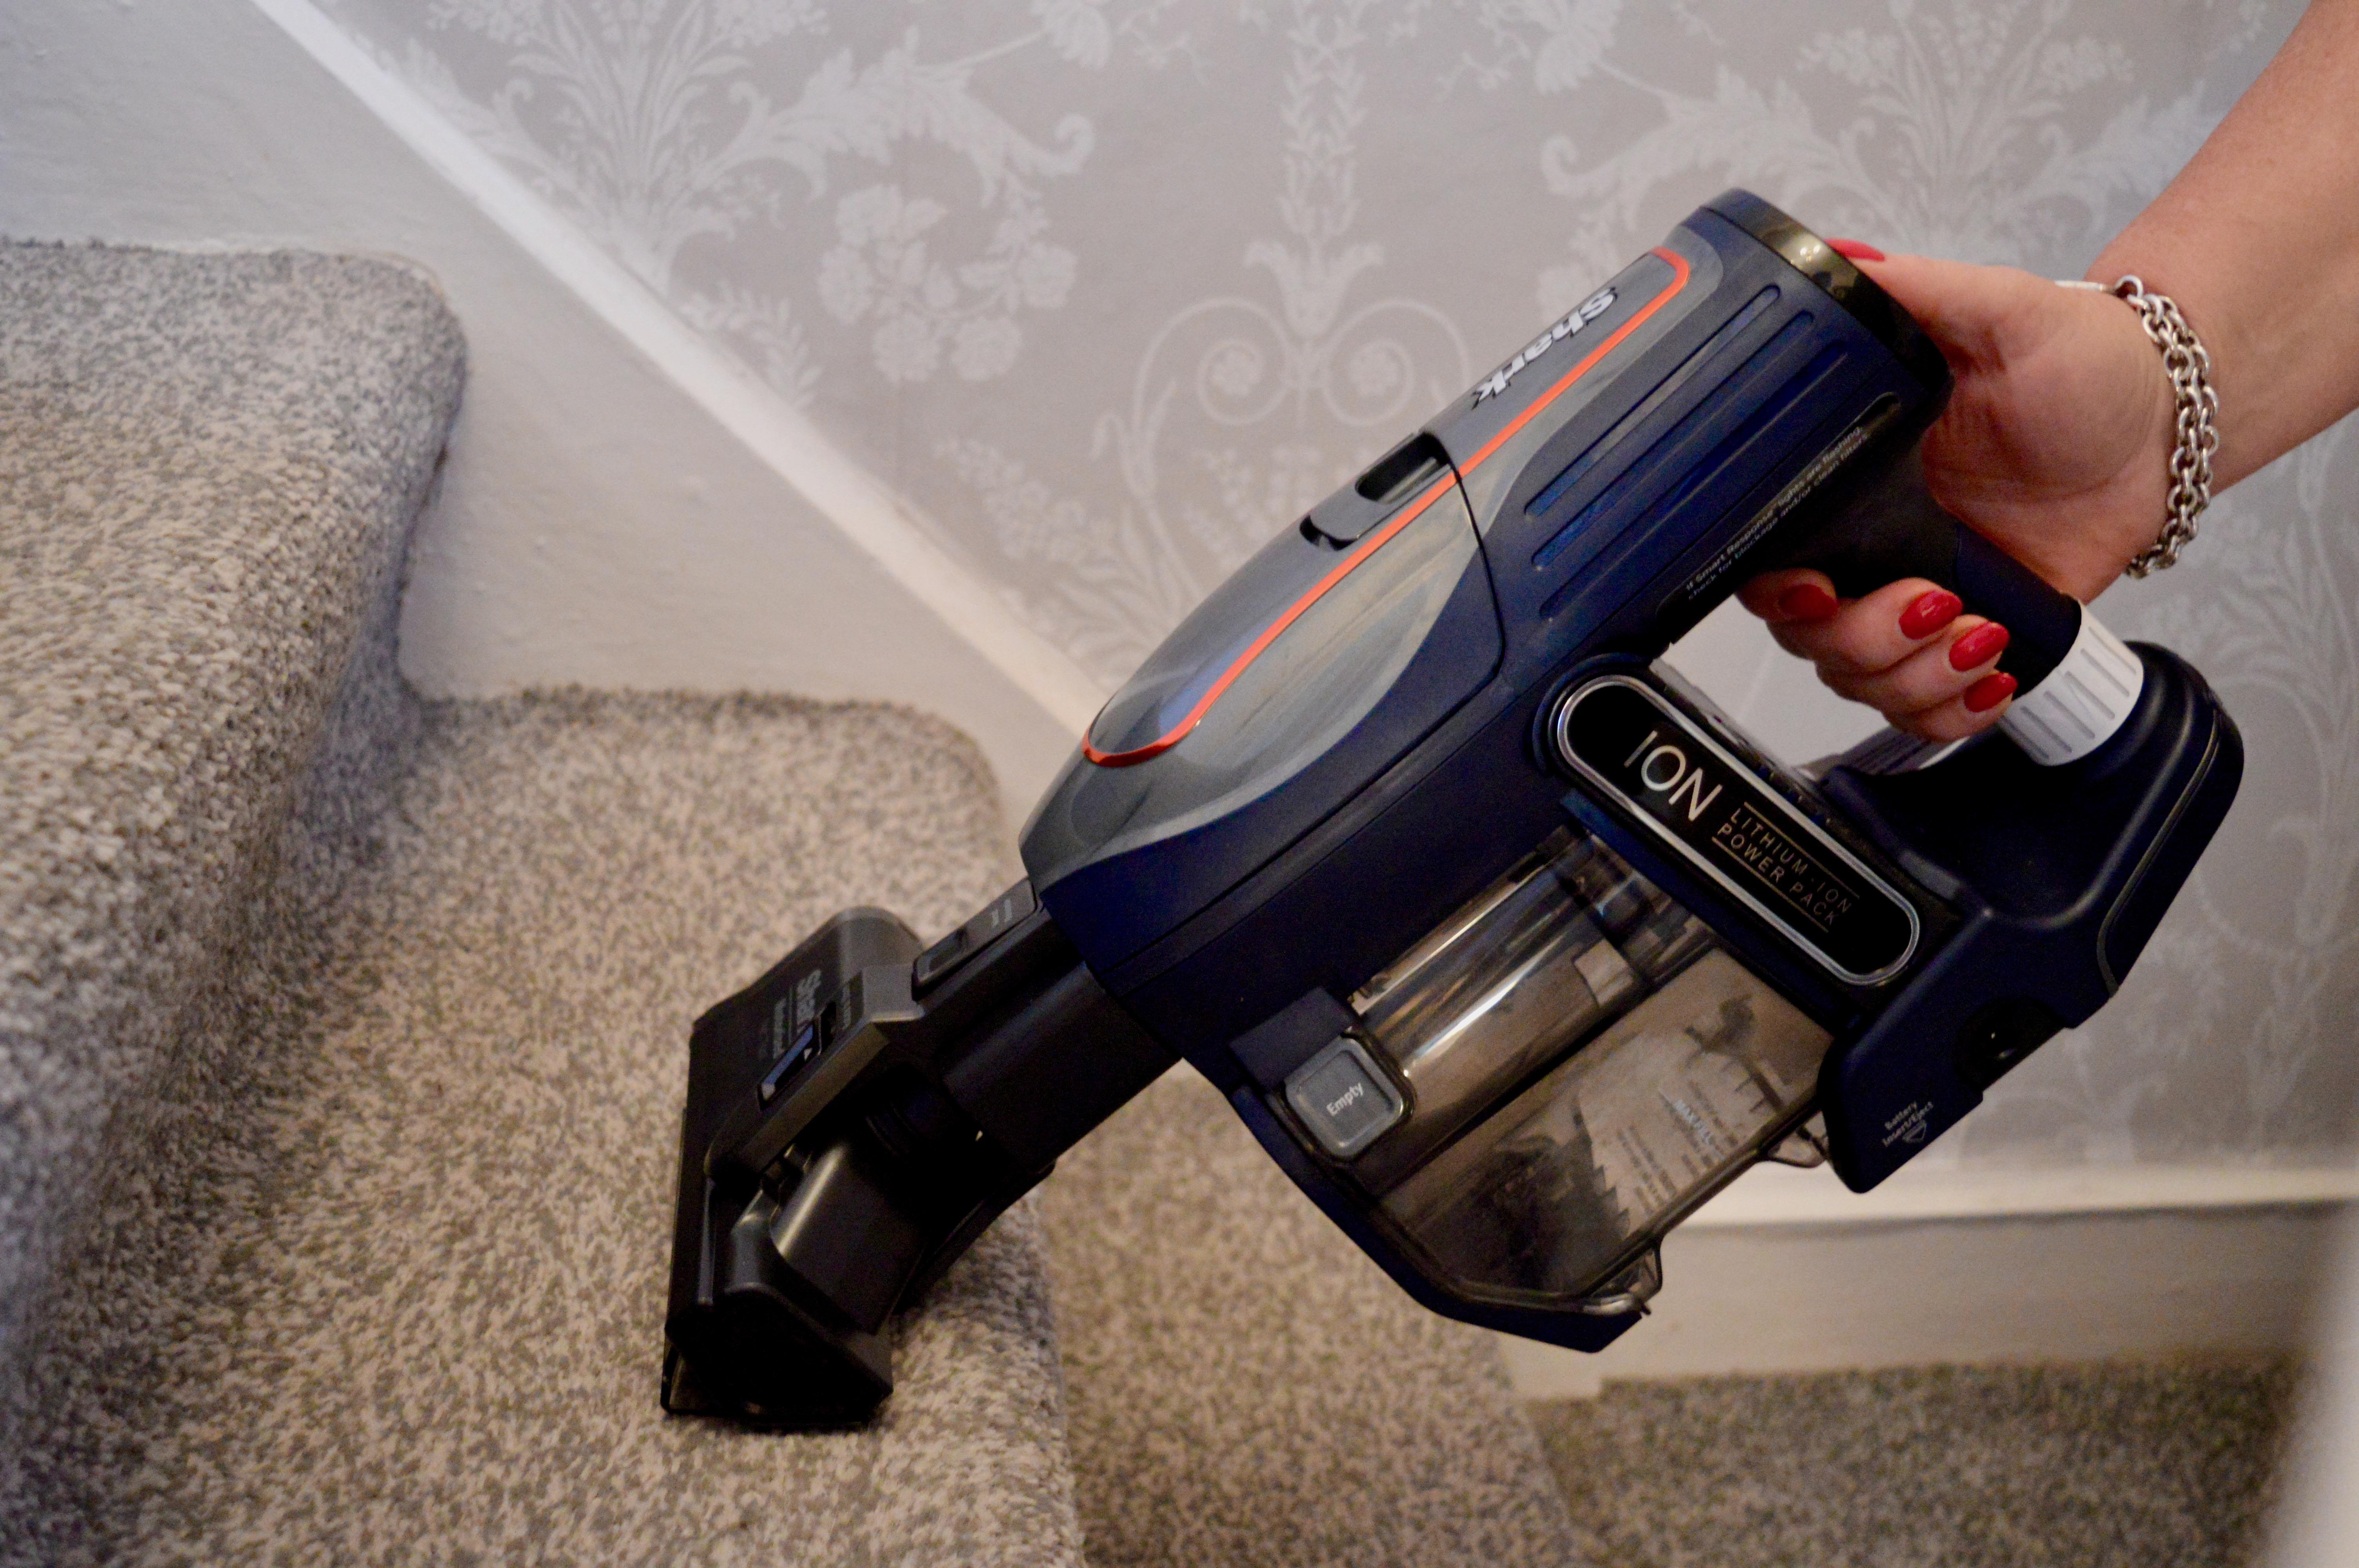 Vacuum Review: Shark DuoClean Cordless Vacuum Cleaner with TruePet Flexology Twin Battery IF250UKT | Elle Blonde Luxury Lifestyle Destination Blog